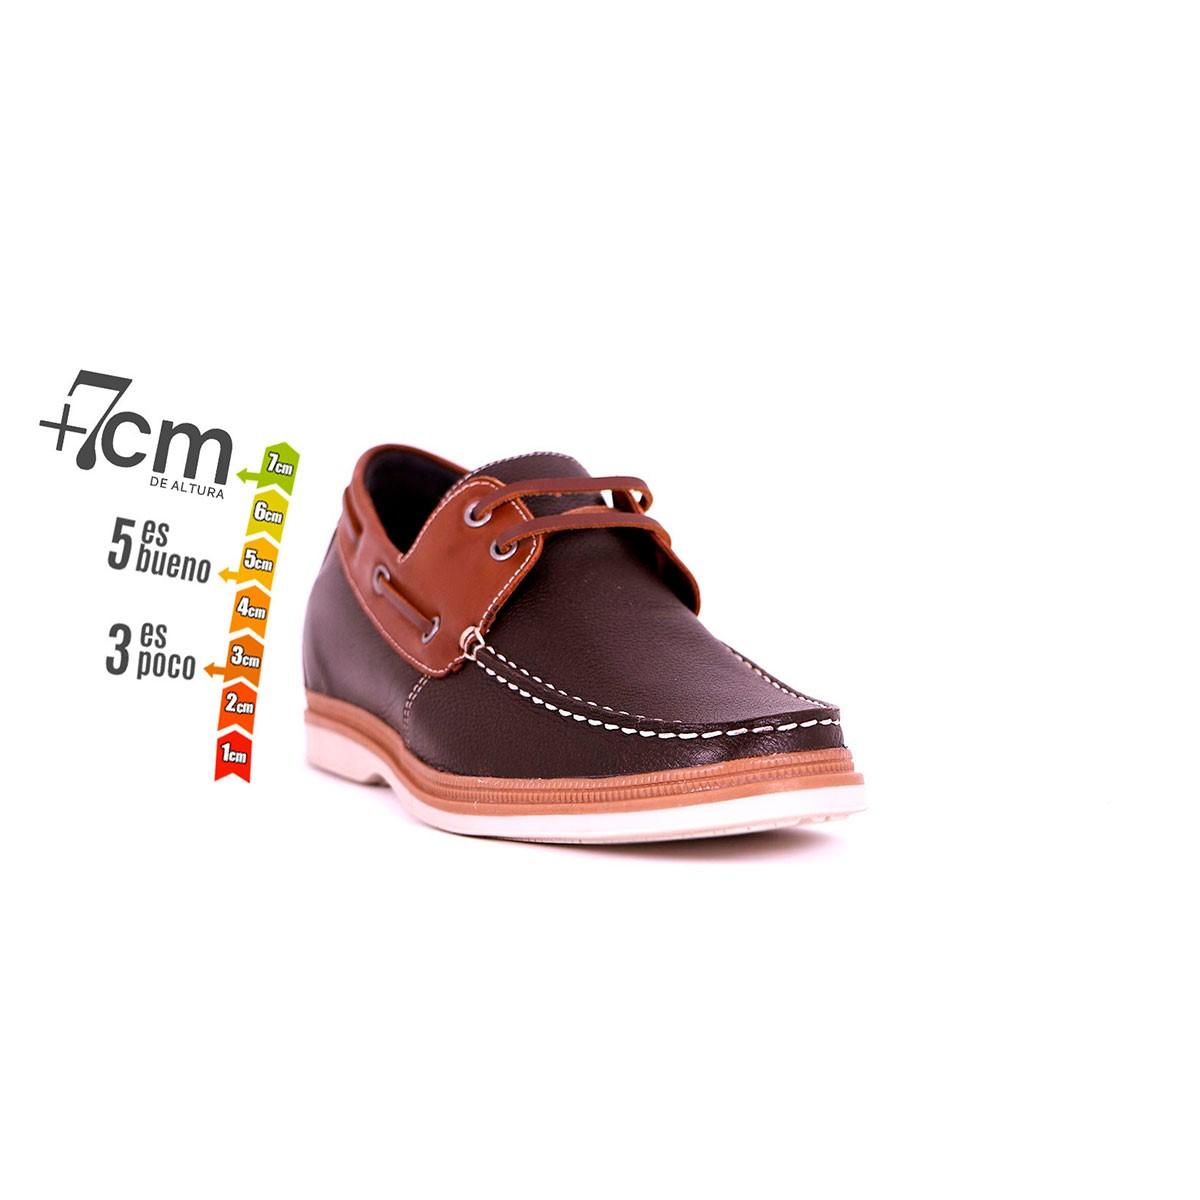 Zapato Casual Walk Café/Café Max Denegri +7cms de Altura_74252